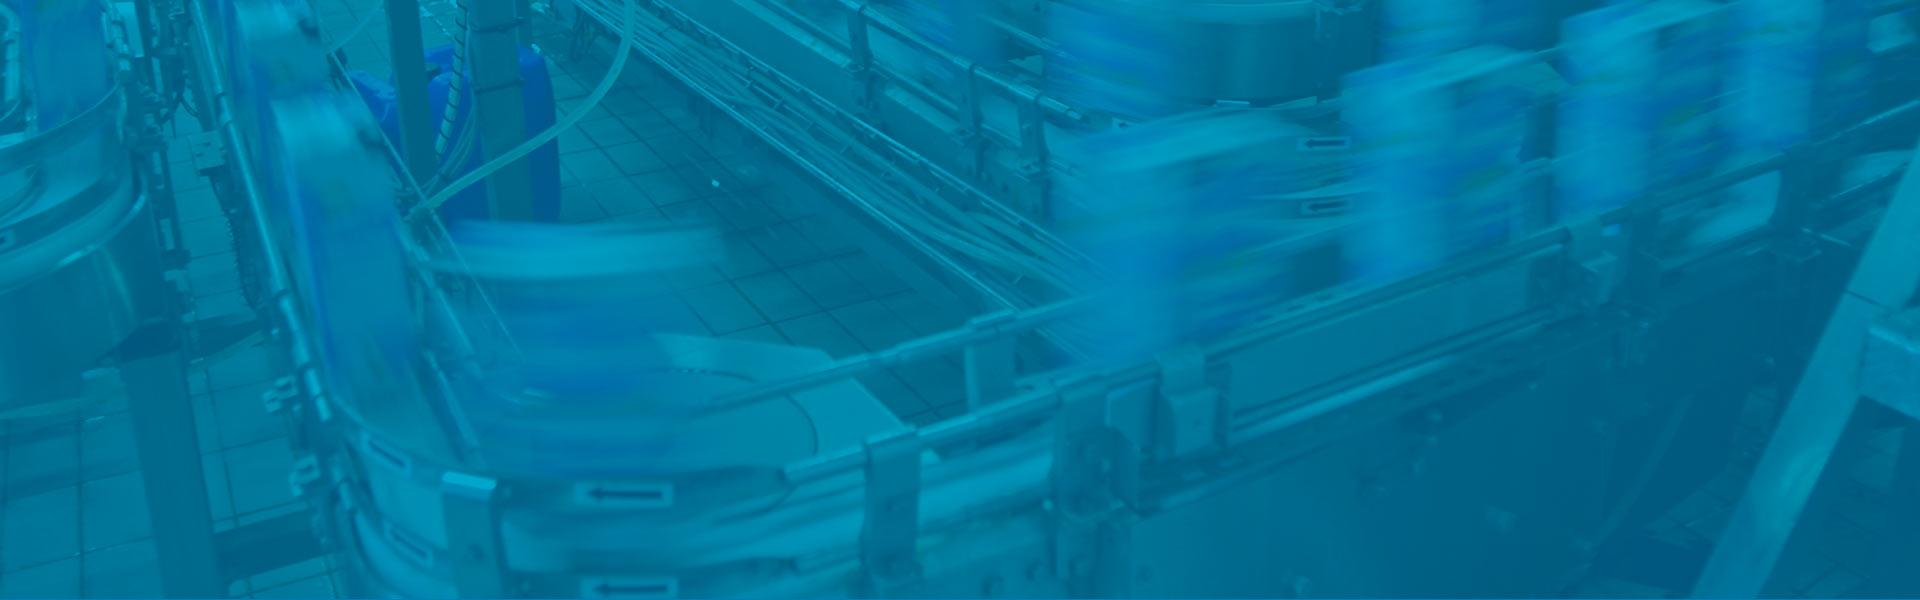 Manufacturing Simulation Software – AnyLogic Simulation Software